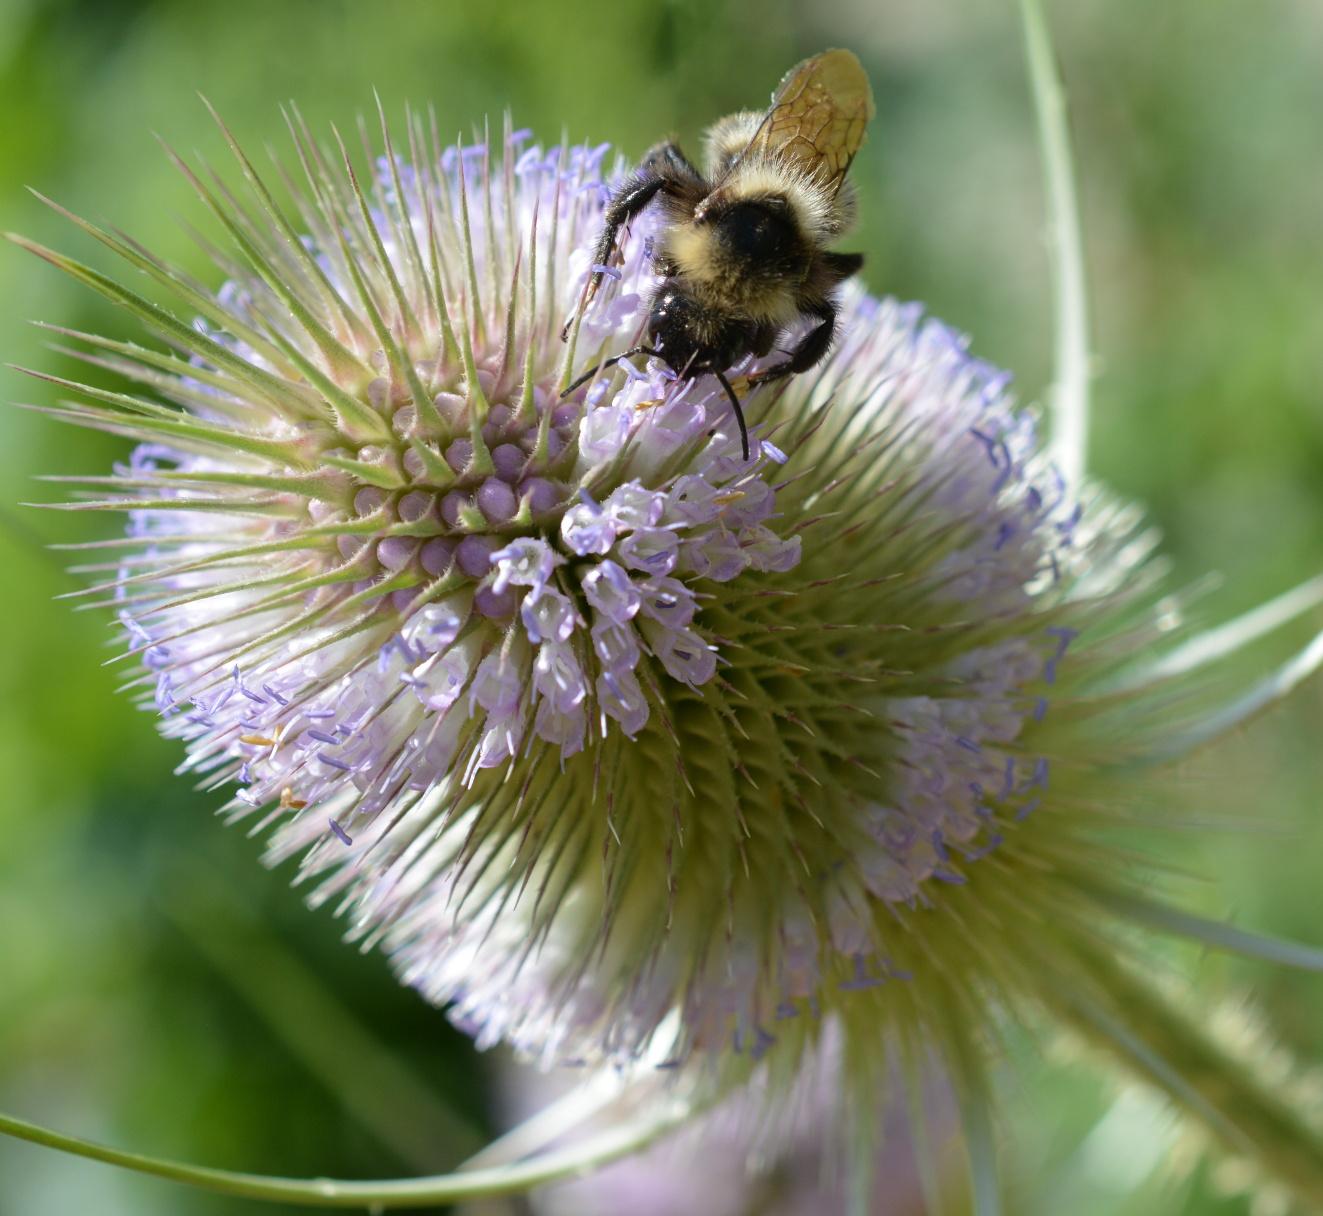 Distelblüte mit Insekt